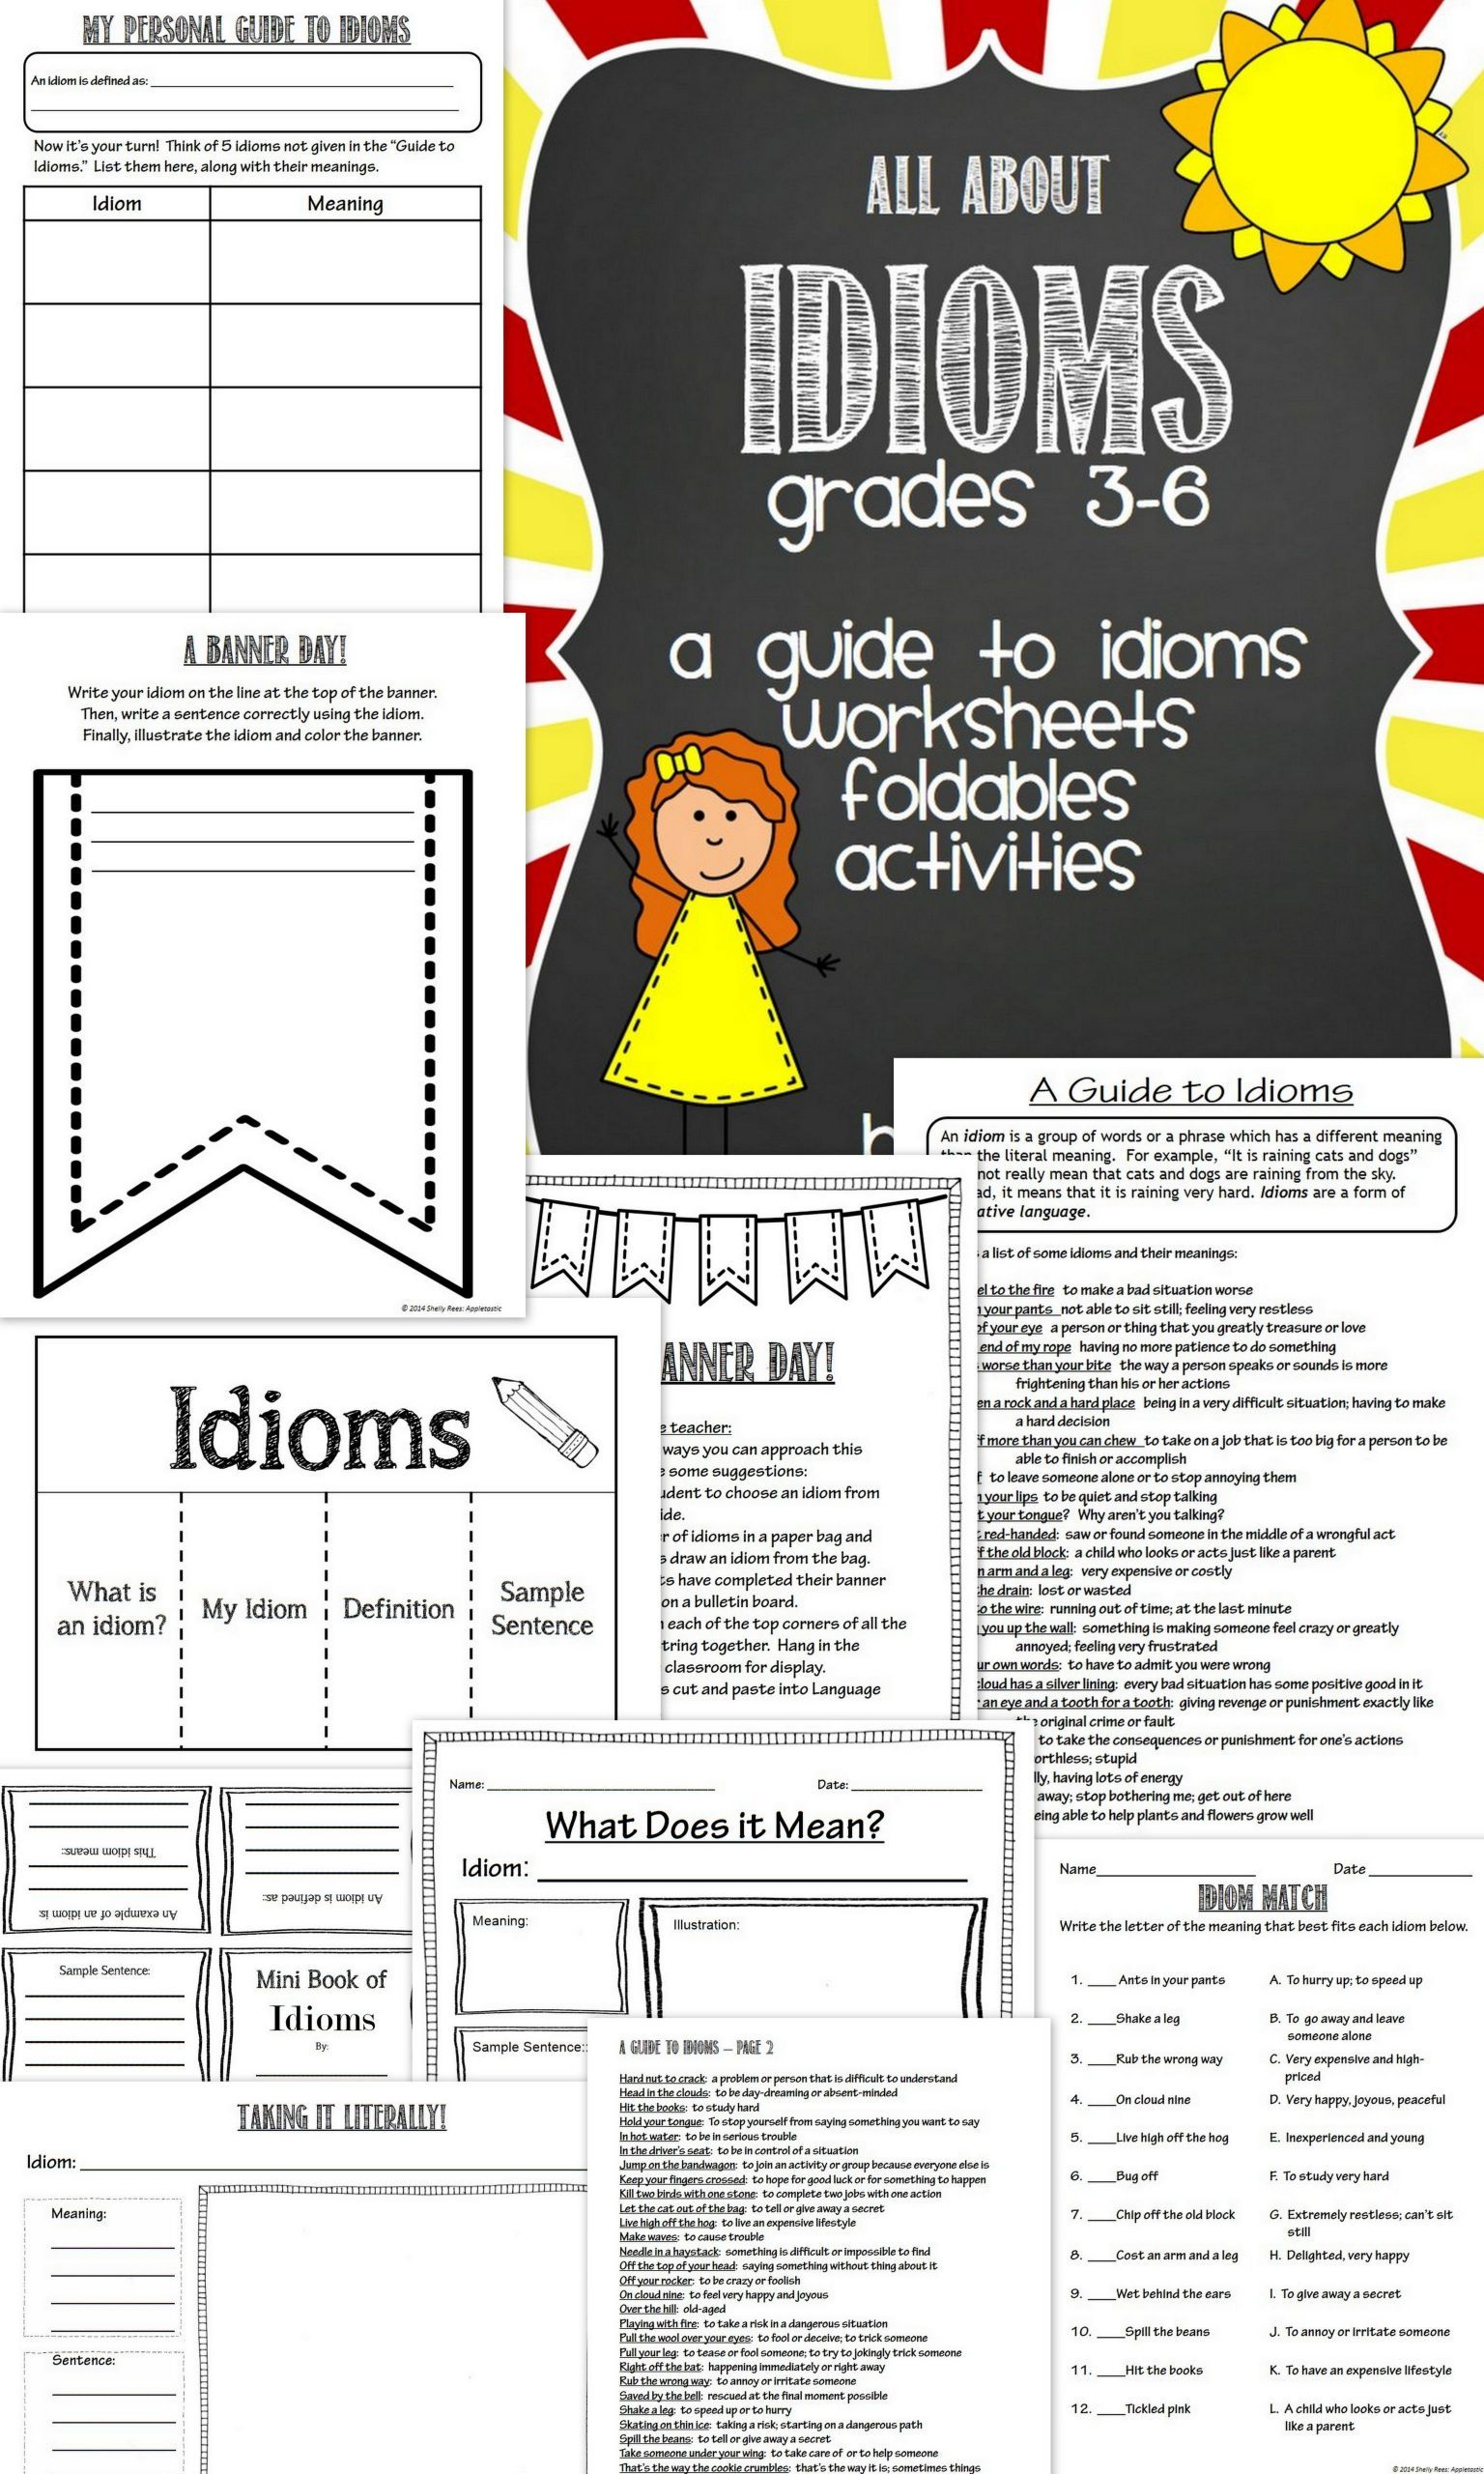 10 Readable Idiom Worksheets 4th Grade Di Dengan Gambar